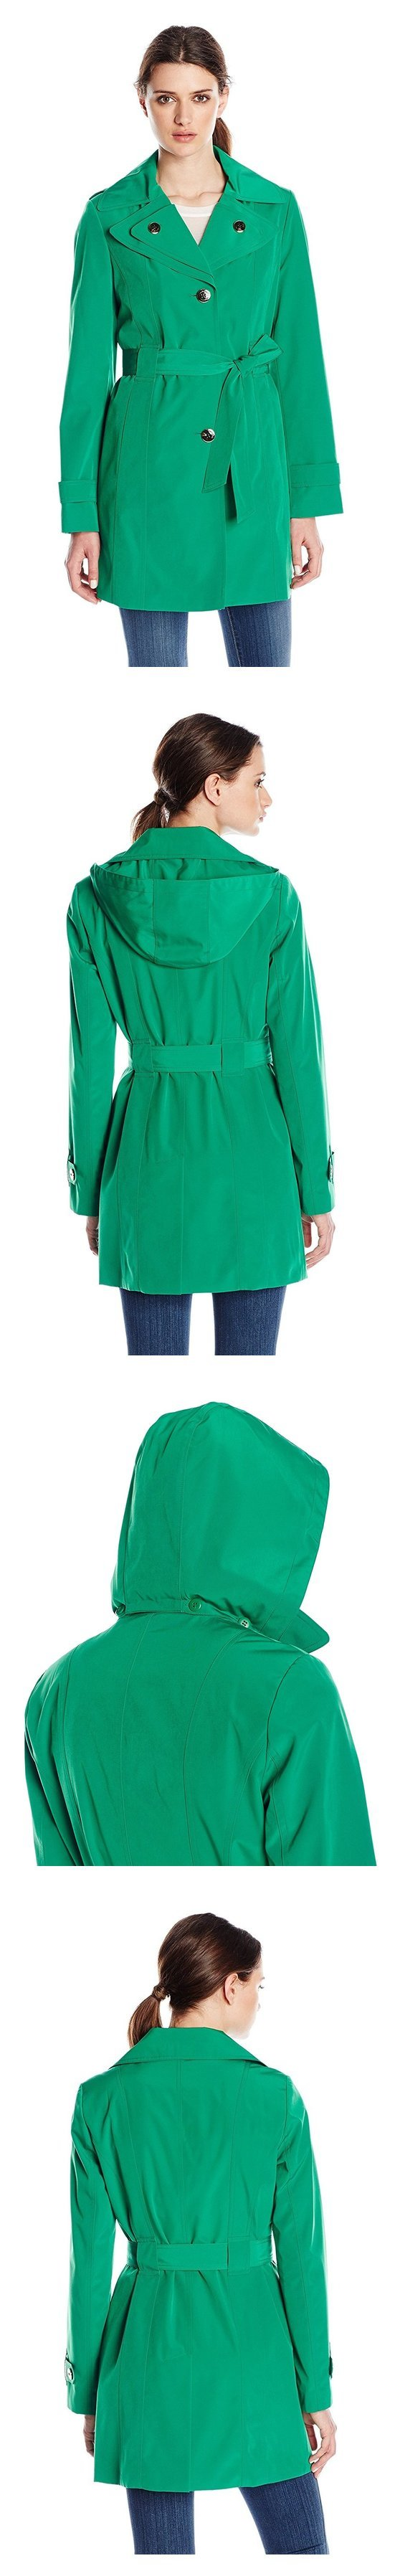 $72.5 - Calvin Klein Women's Single-Breasted Double-Collar Trench Coat Kelly Green #calvin #klein